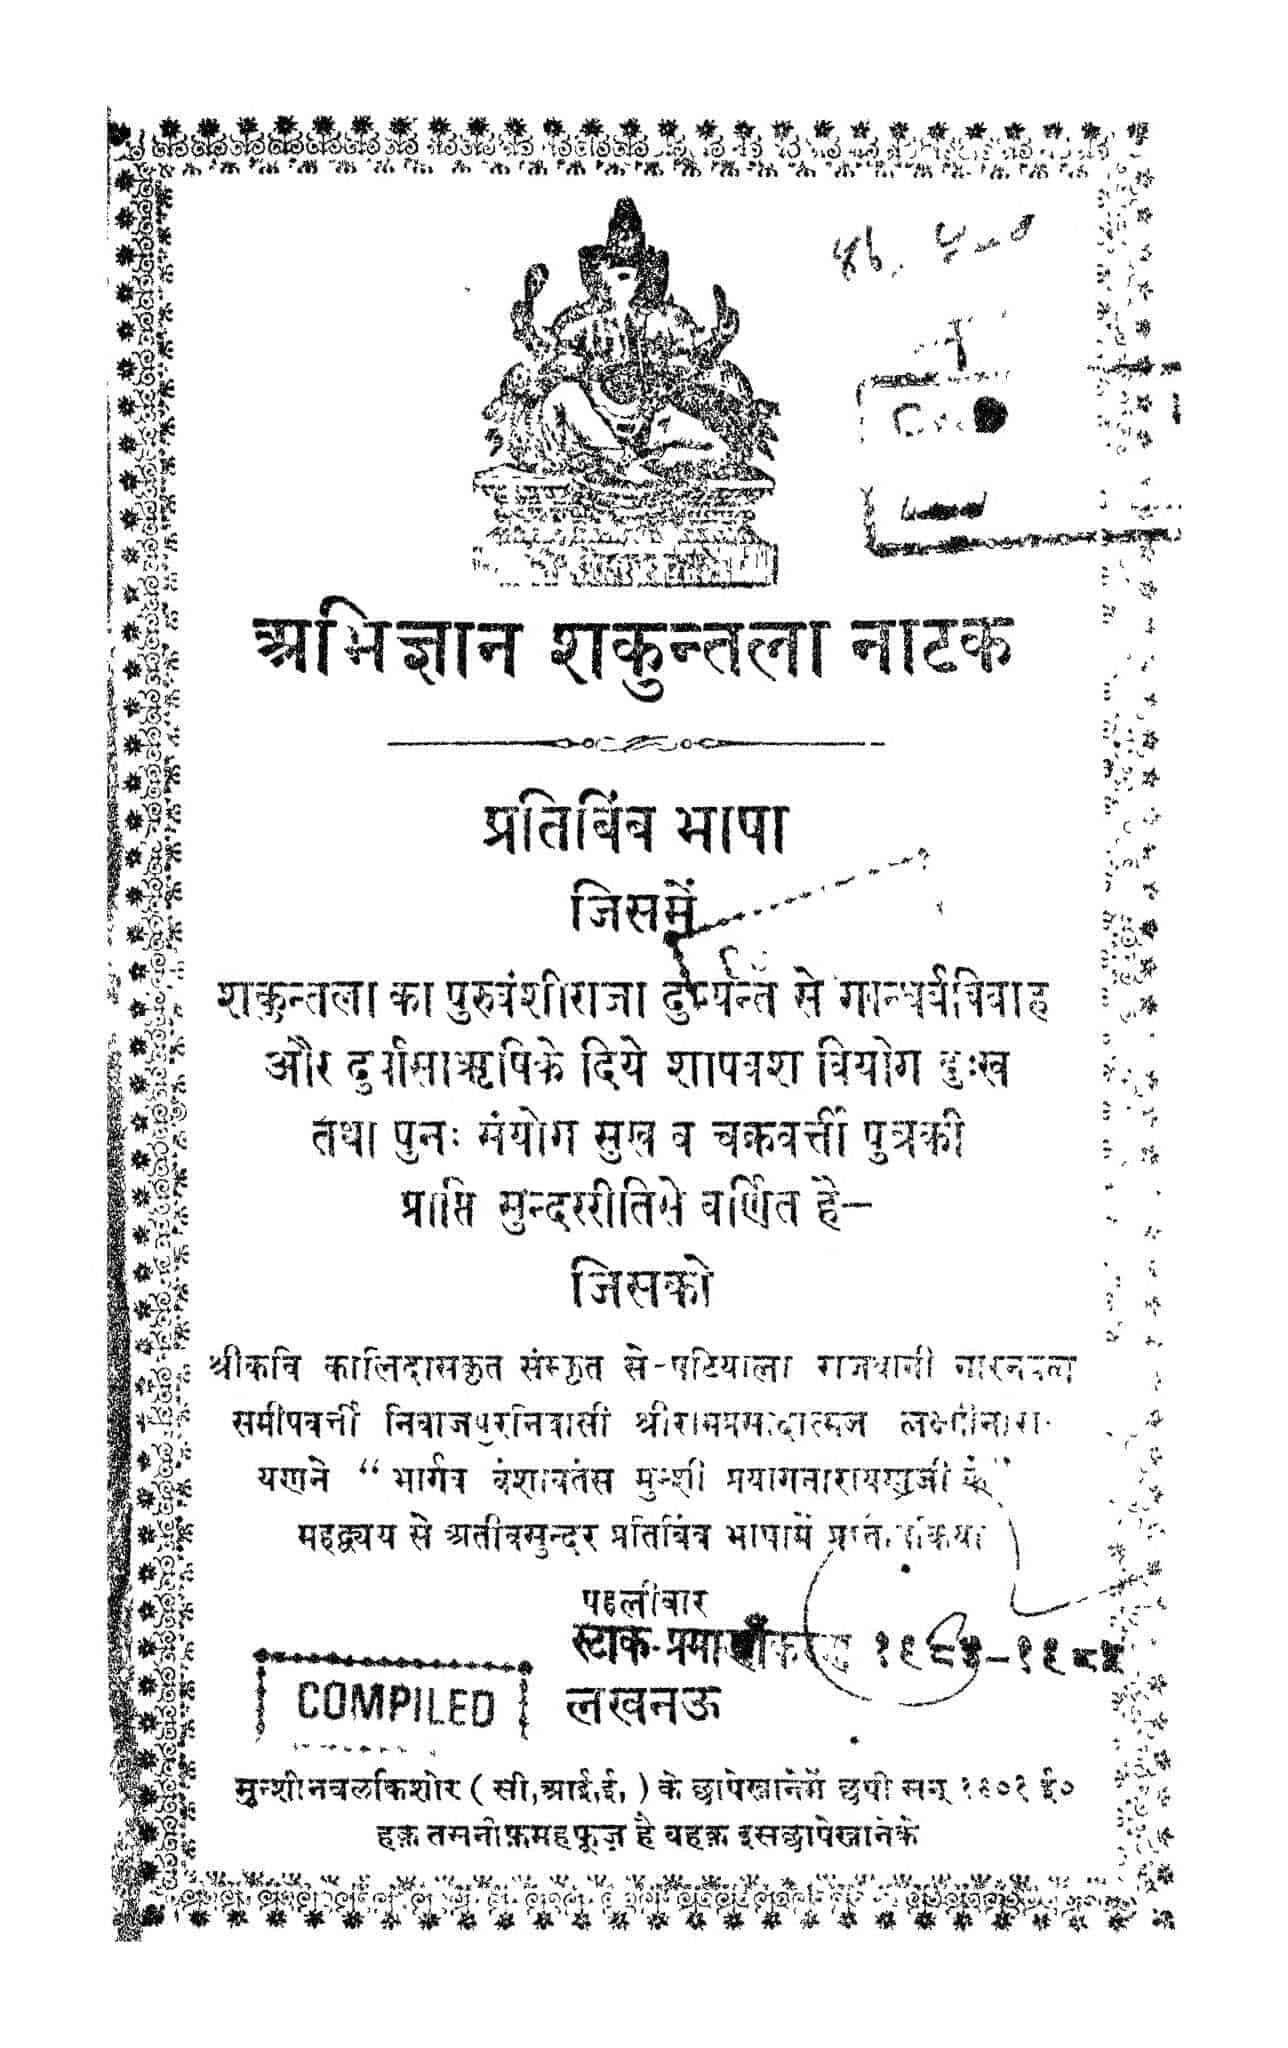 Book Image : अभिज्ञान शकुन्तला नाटक - Abhigyan Shakuntala Natak